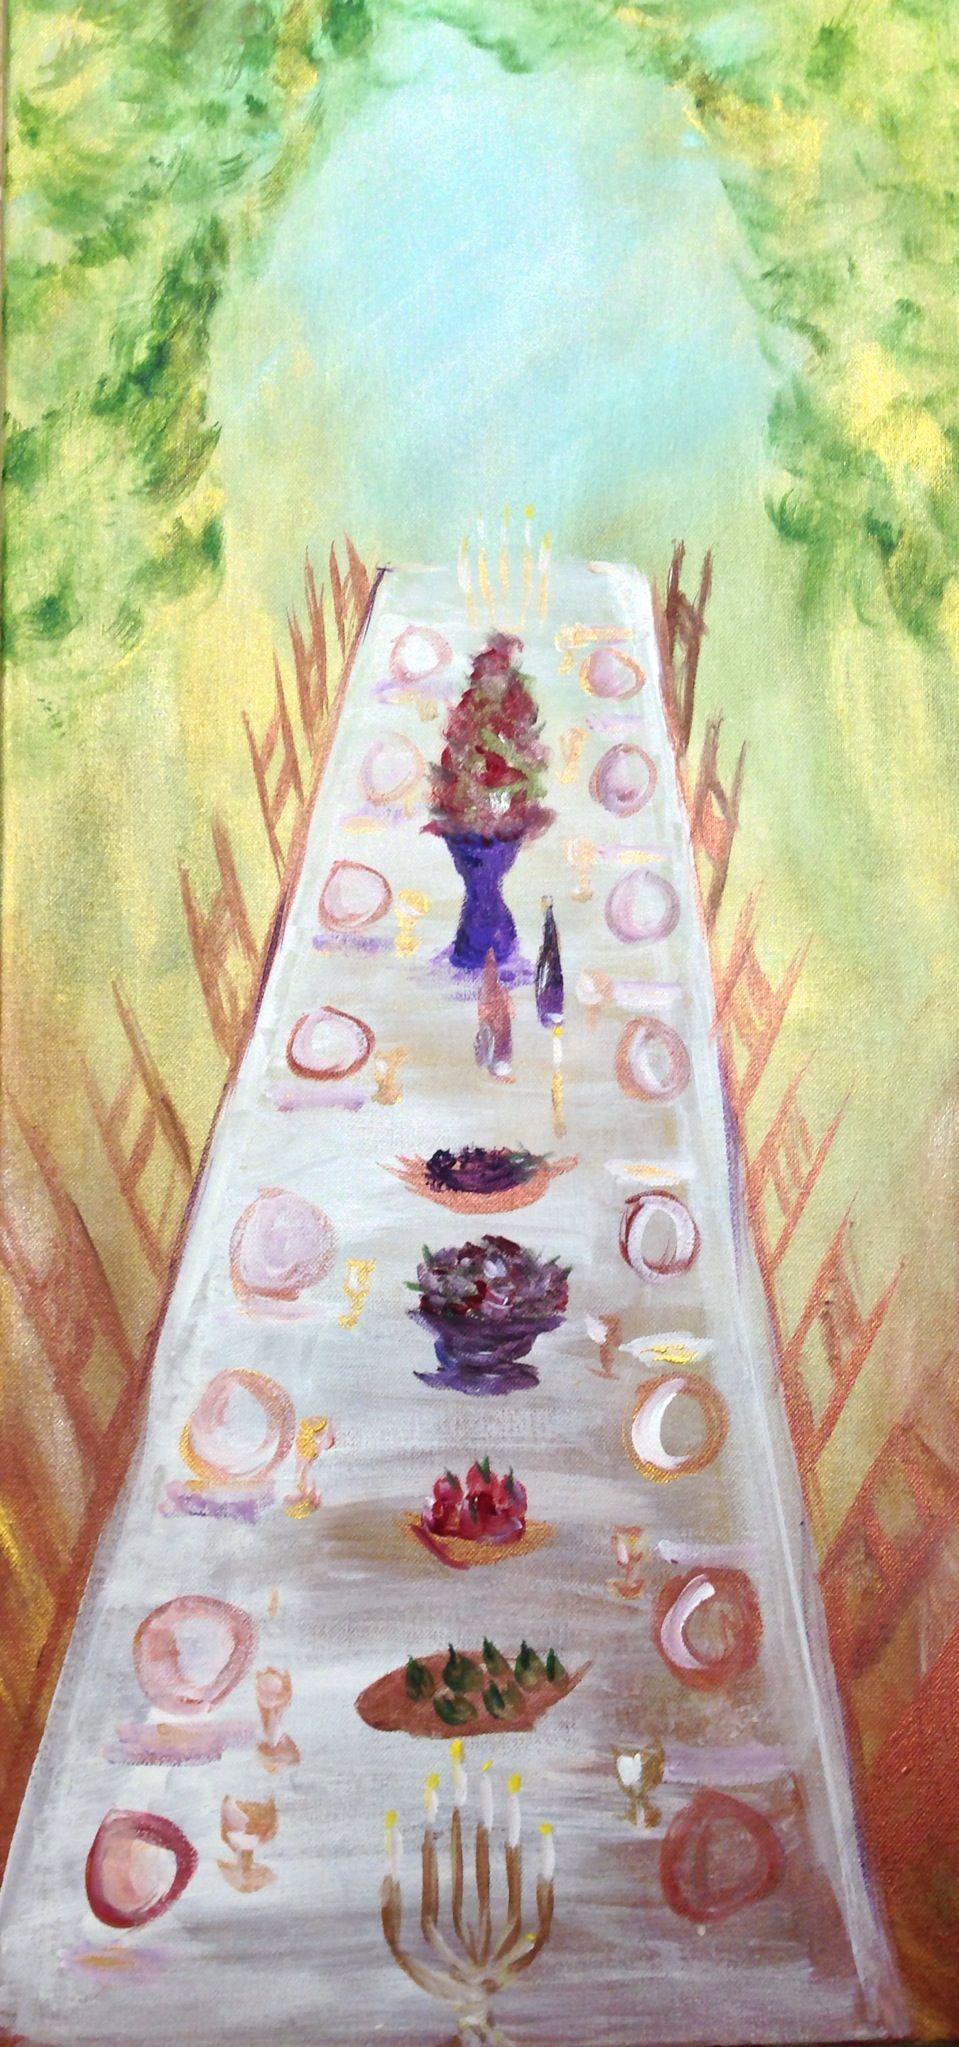 The Banquet Table Prophetic Art Bunny Art Projects Prophetic